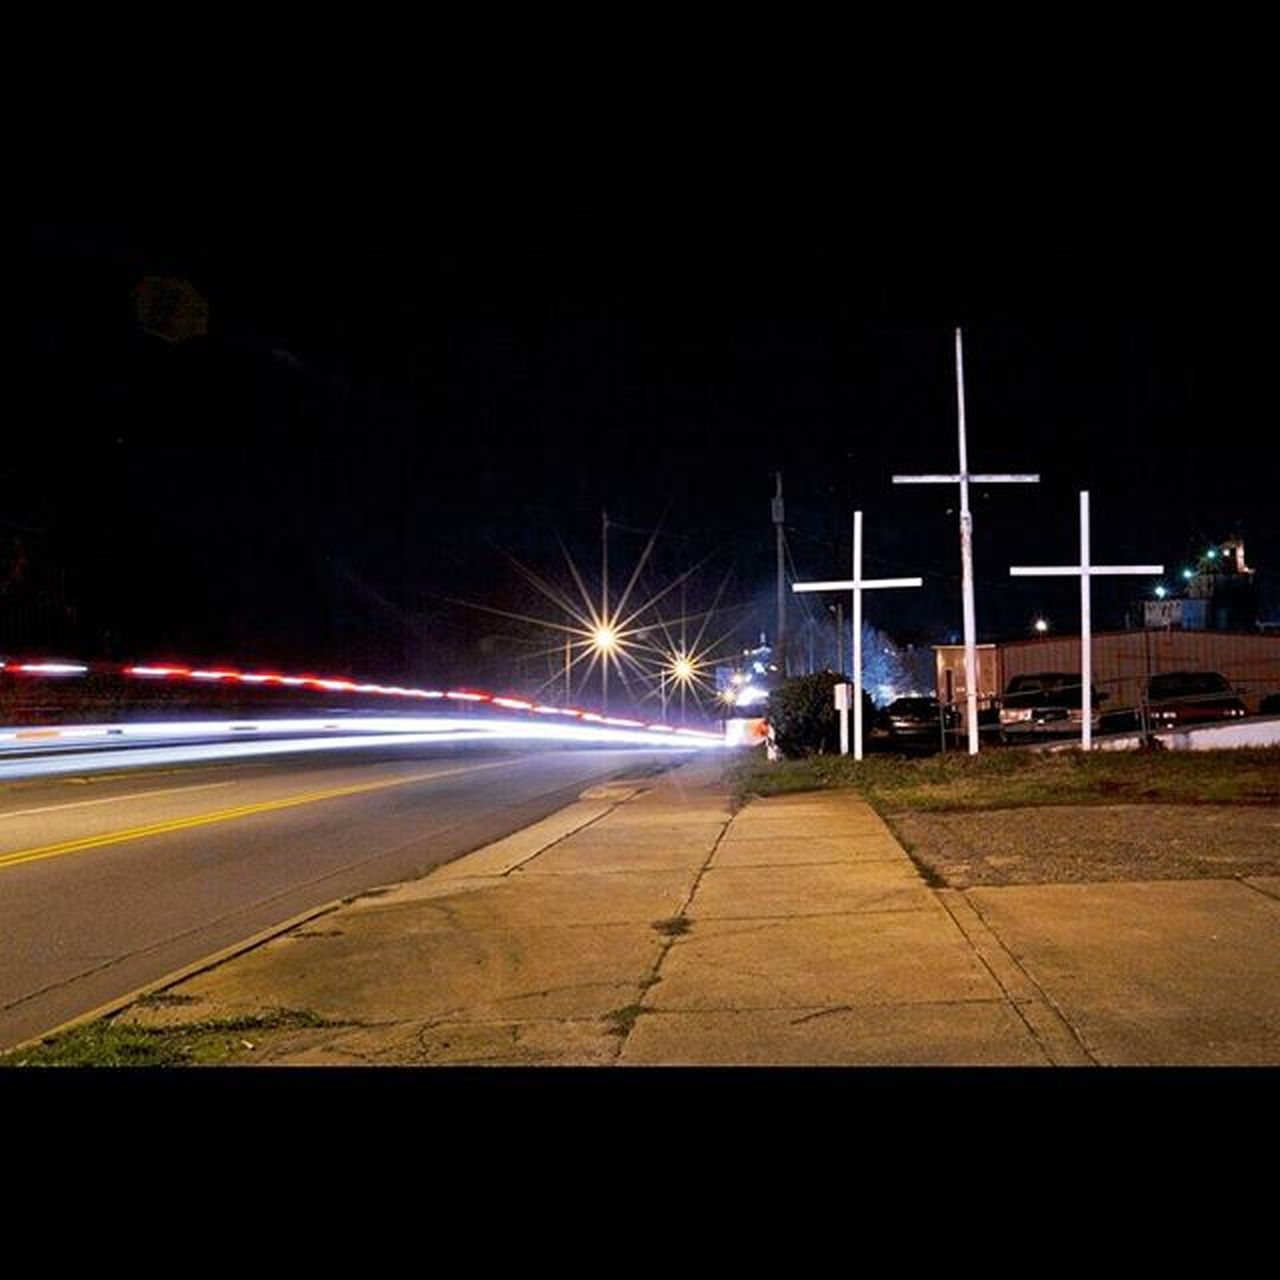 Night view of Center St in Statesville, NC. _____________________________________ _______________________________________________________________________________________________________________ Statesville Northcarolina Religion America Americanculture Nighttime Nightscene Lighttrails Southernculture Nightshooters Subjectivelyobjective Nightphotography Nightphoto Urbanlandscape Streetshooter Streetphotography Streetphotographer Streetphoto Documentaryphoto Documentaryphotography Agameoftones AtWarWithTheObvious Newtopographics Fotoguerrilla Shootermag NoiceMag YetMagazine photozine photowork PhotoOfTheDay